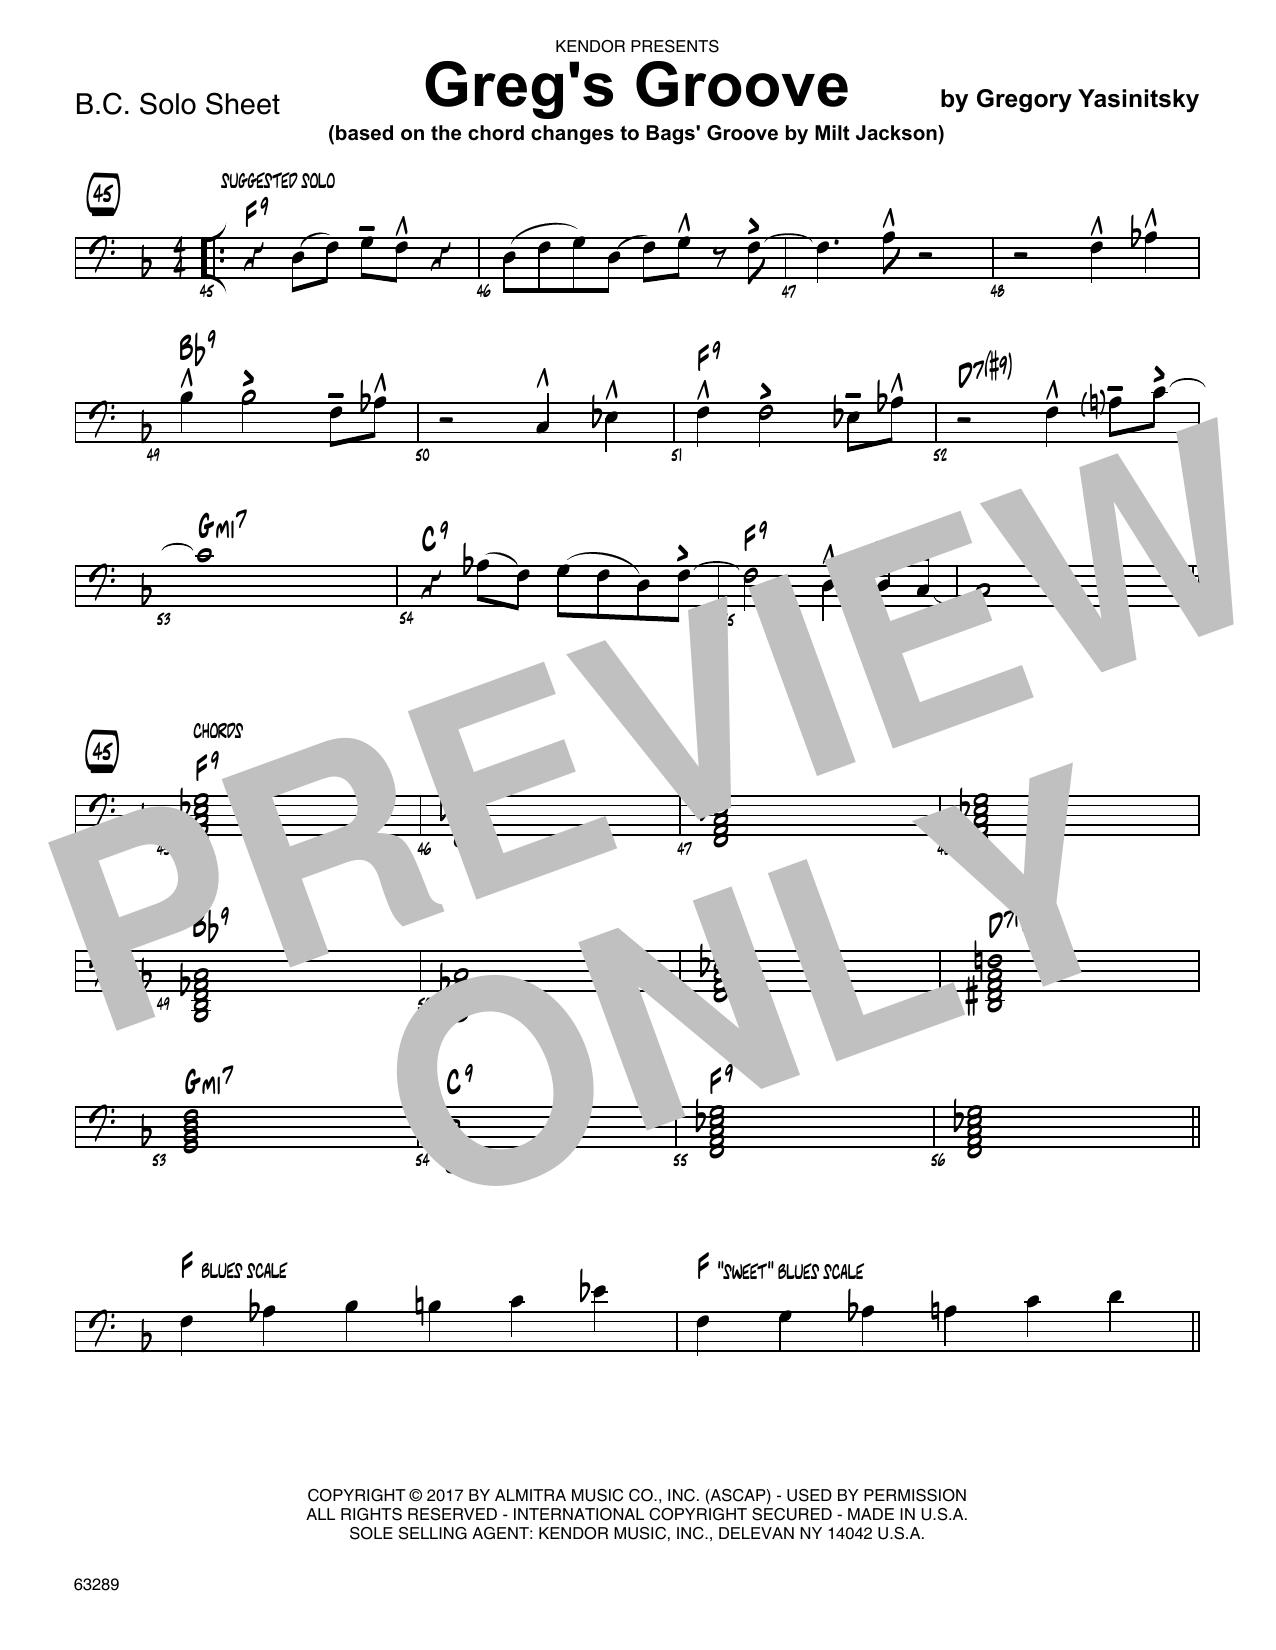 Greg's Groove - Solo Sheet - Trombone Sheet Music